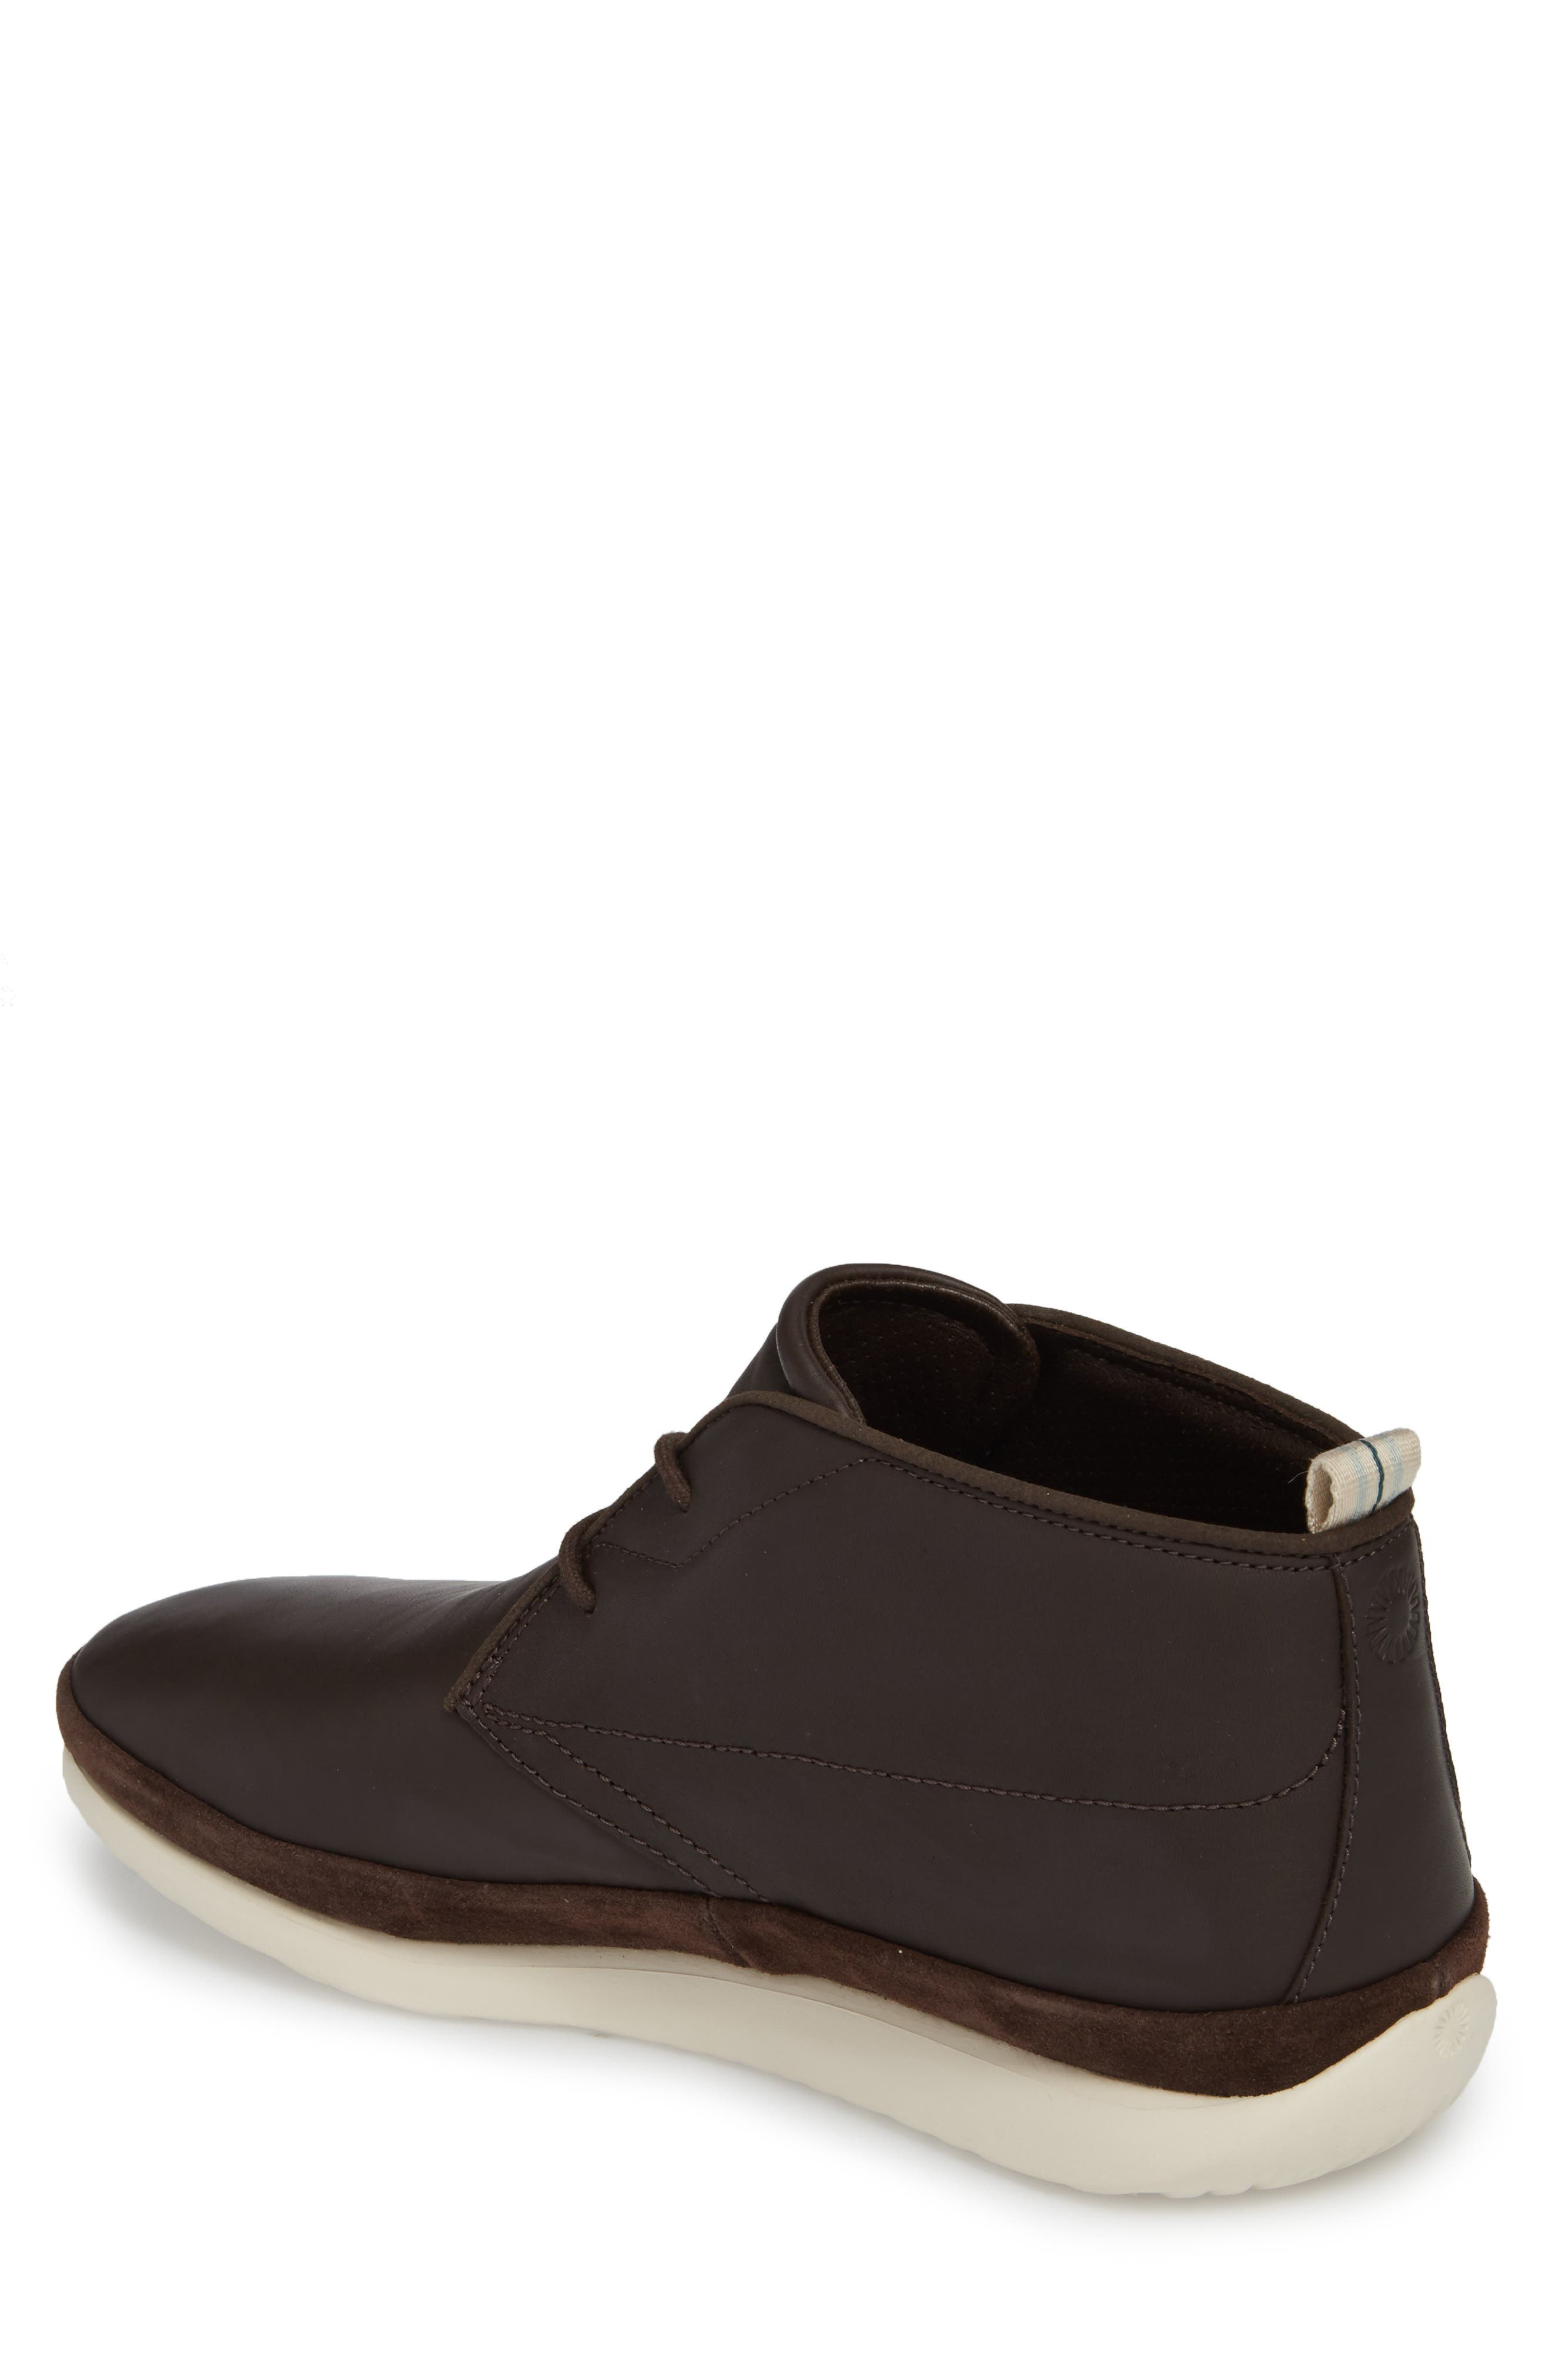 Cali Chukka Boot,                             Alternate thumbnail 2, color,                             Stout Leather